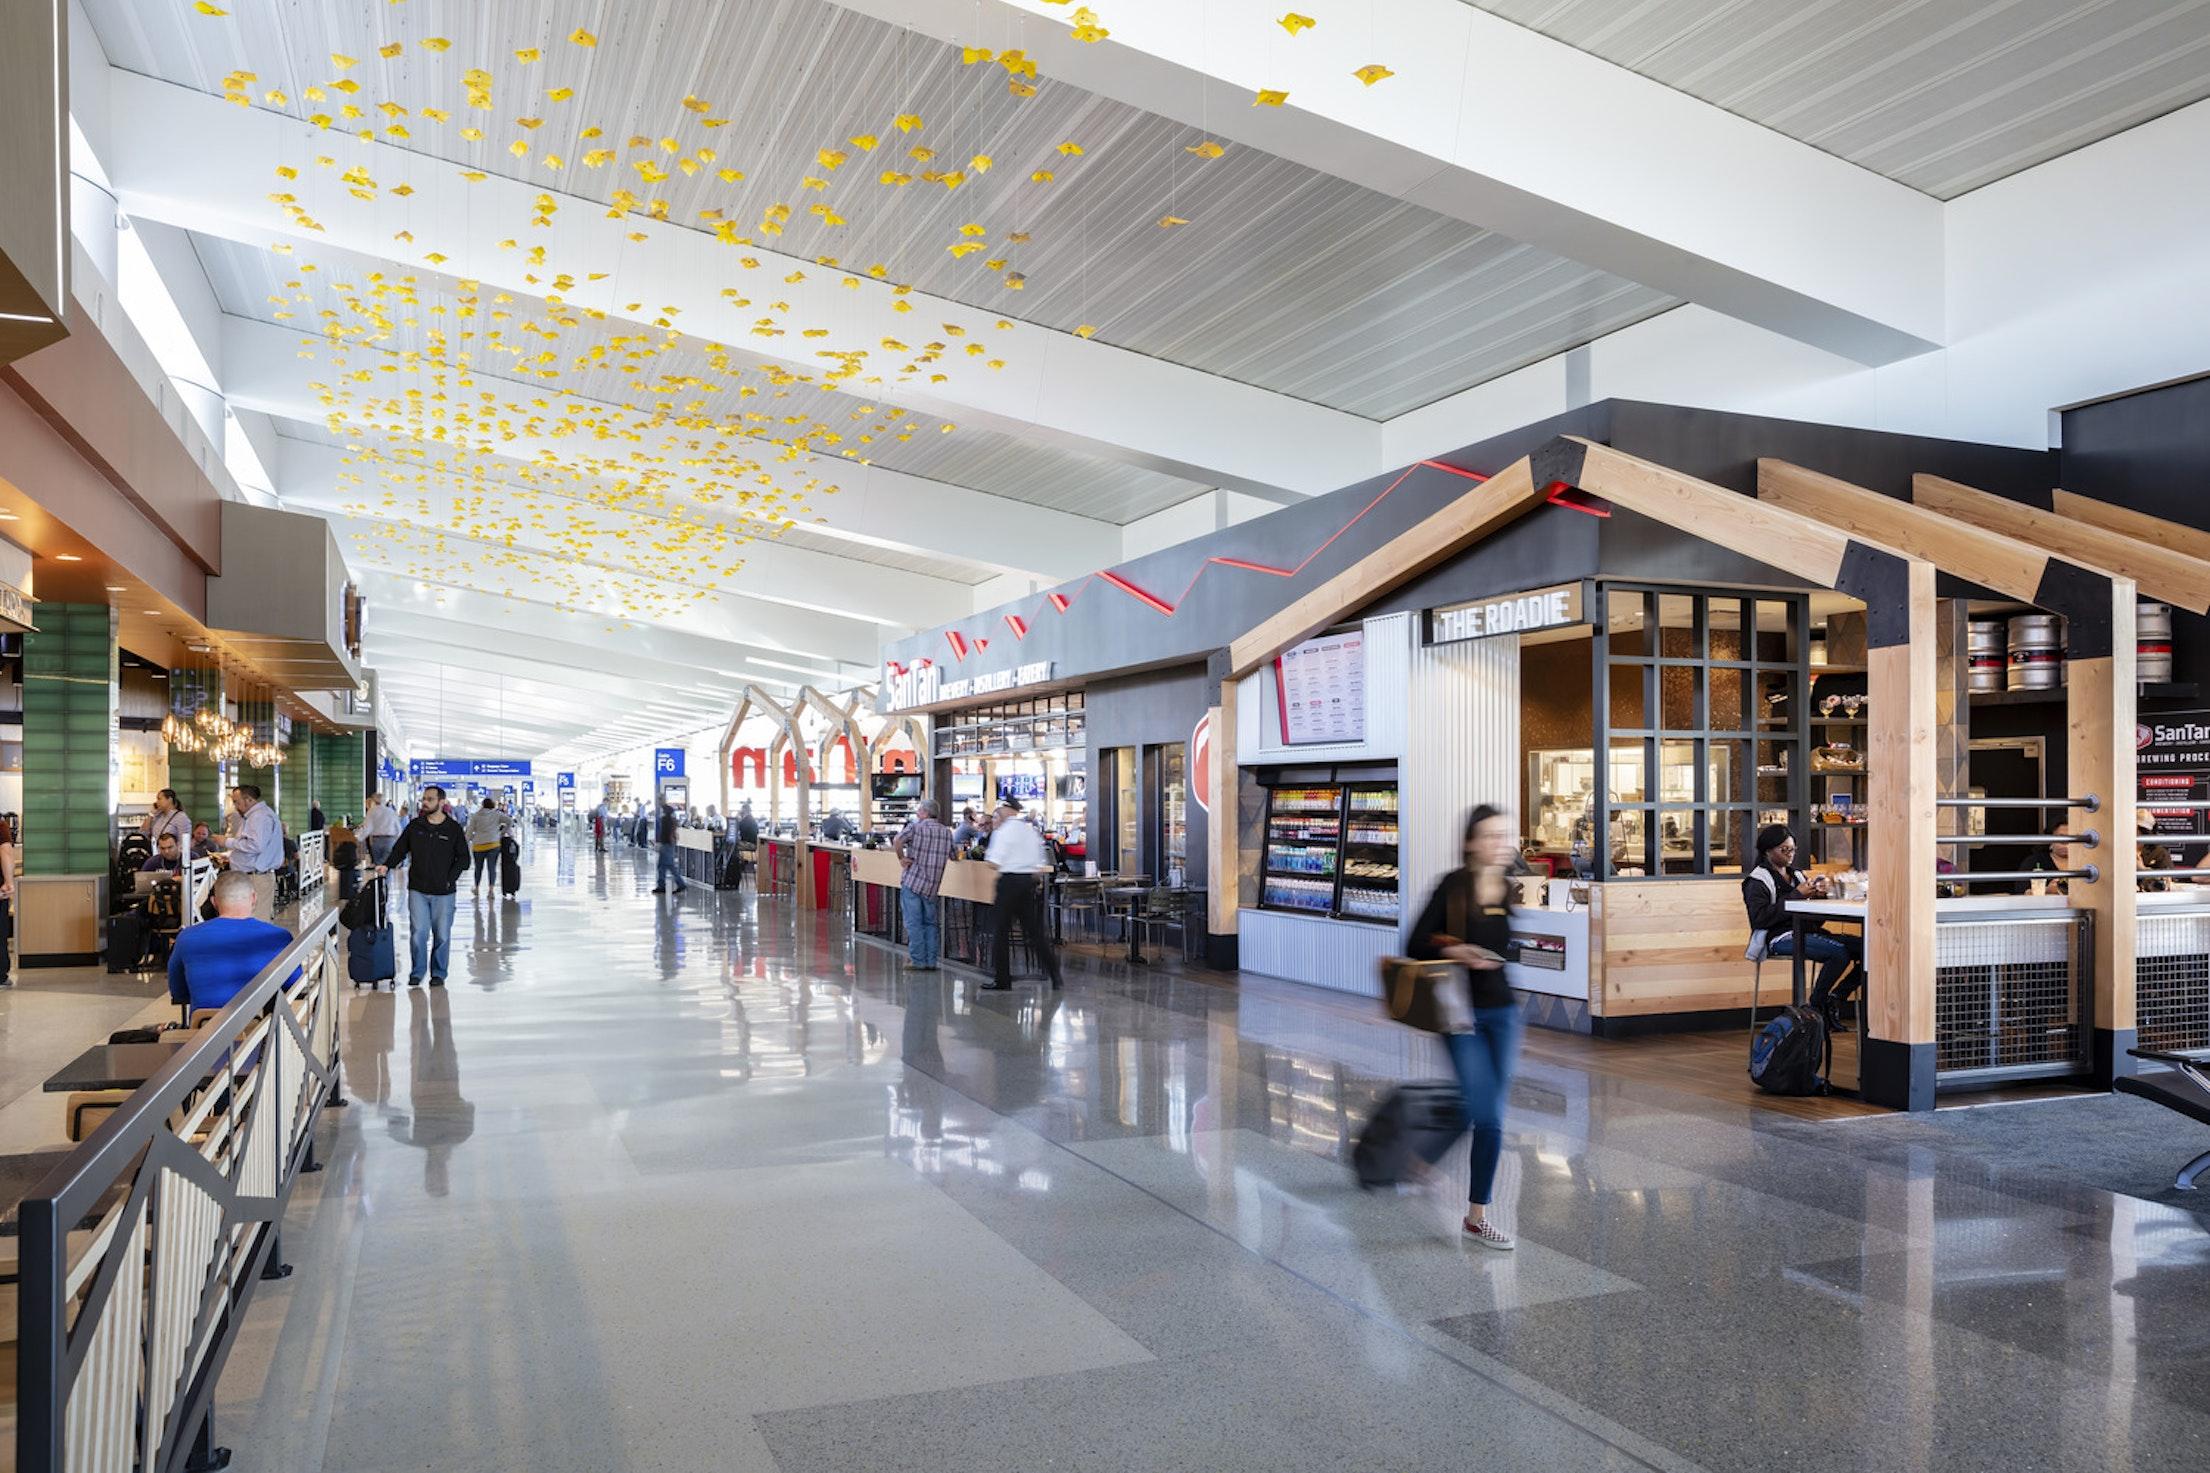 Lightart palo verde blossom mobile South Concourse Phoenix Airport 1